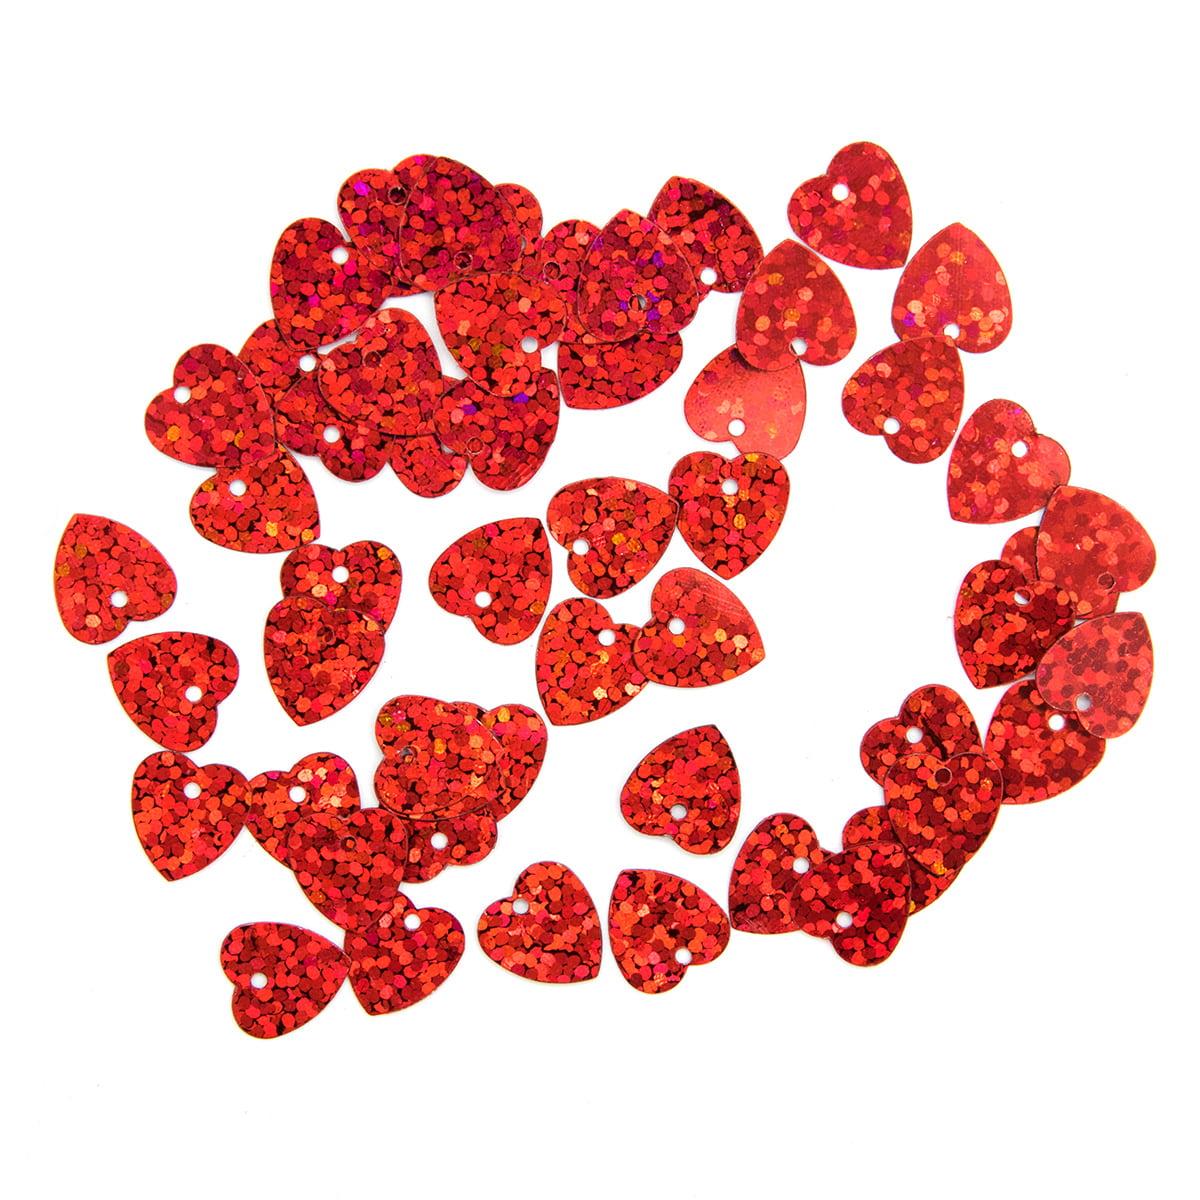 Пайетки 'сердечки', 10*10 мм, упак./10 гр., 'Астра' (50103 красный голограмма) фото